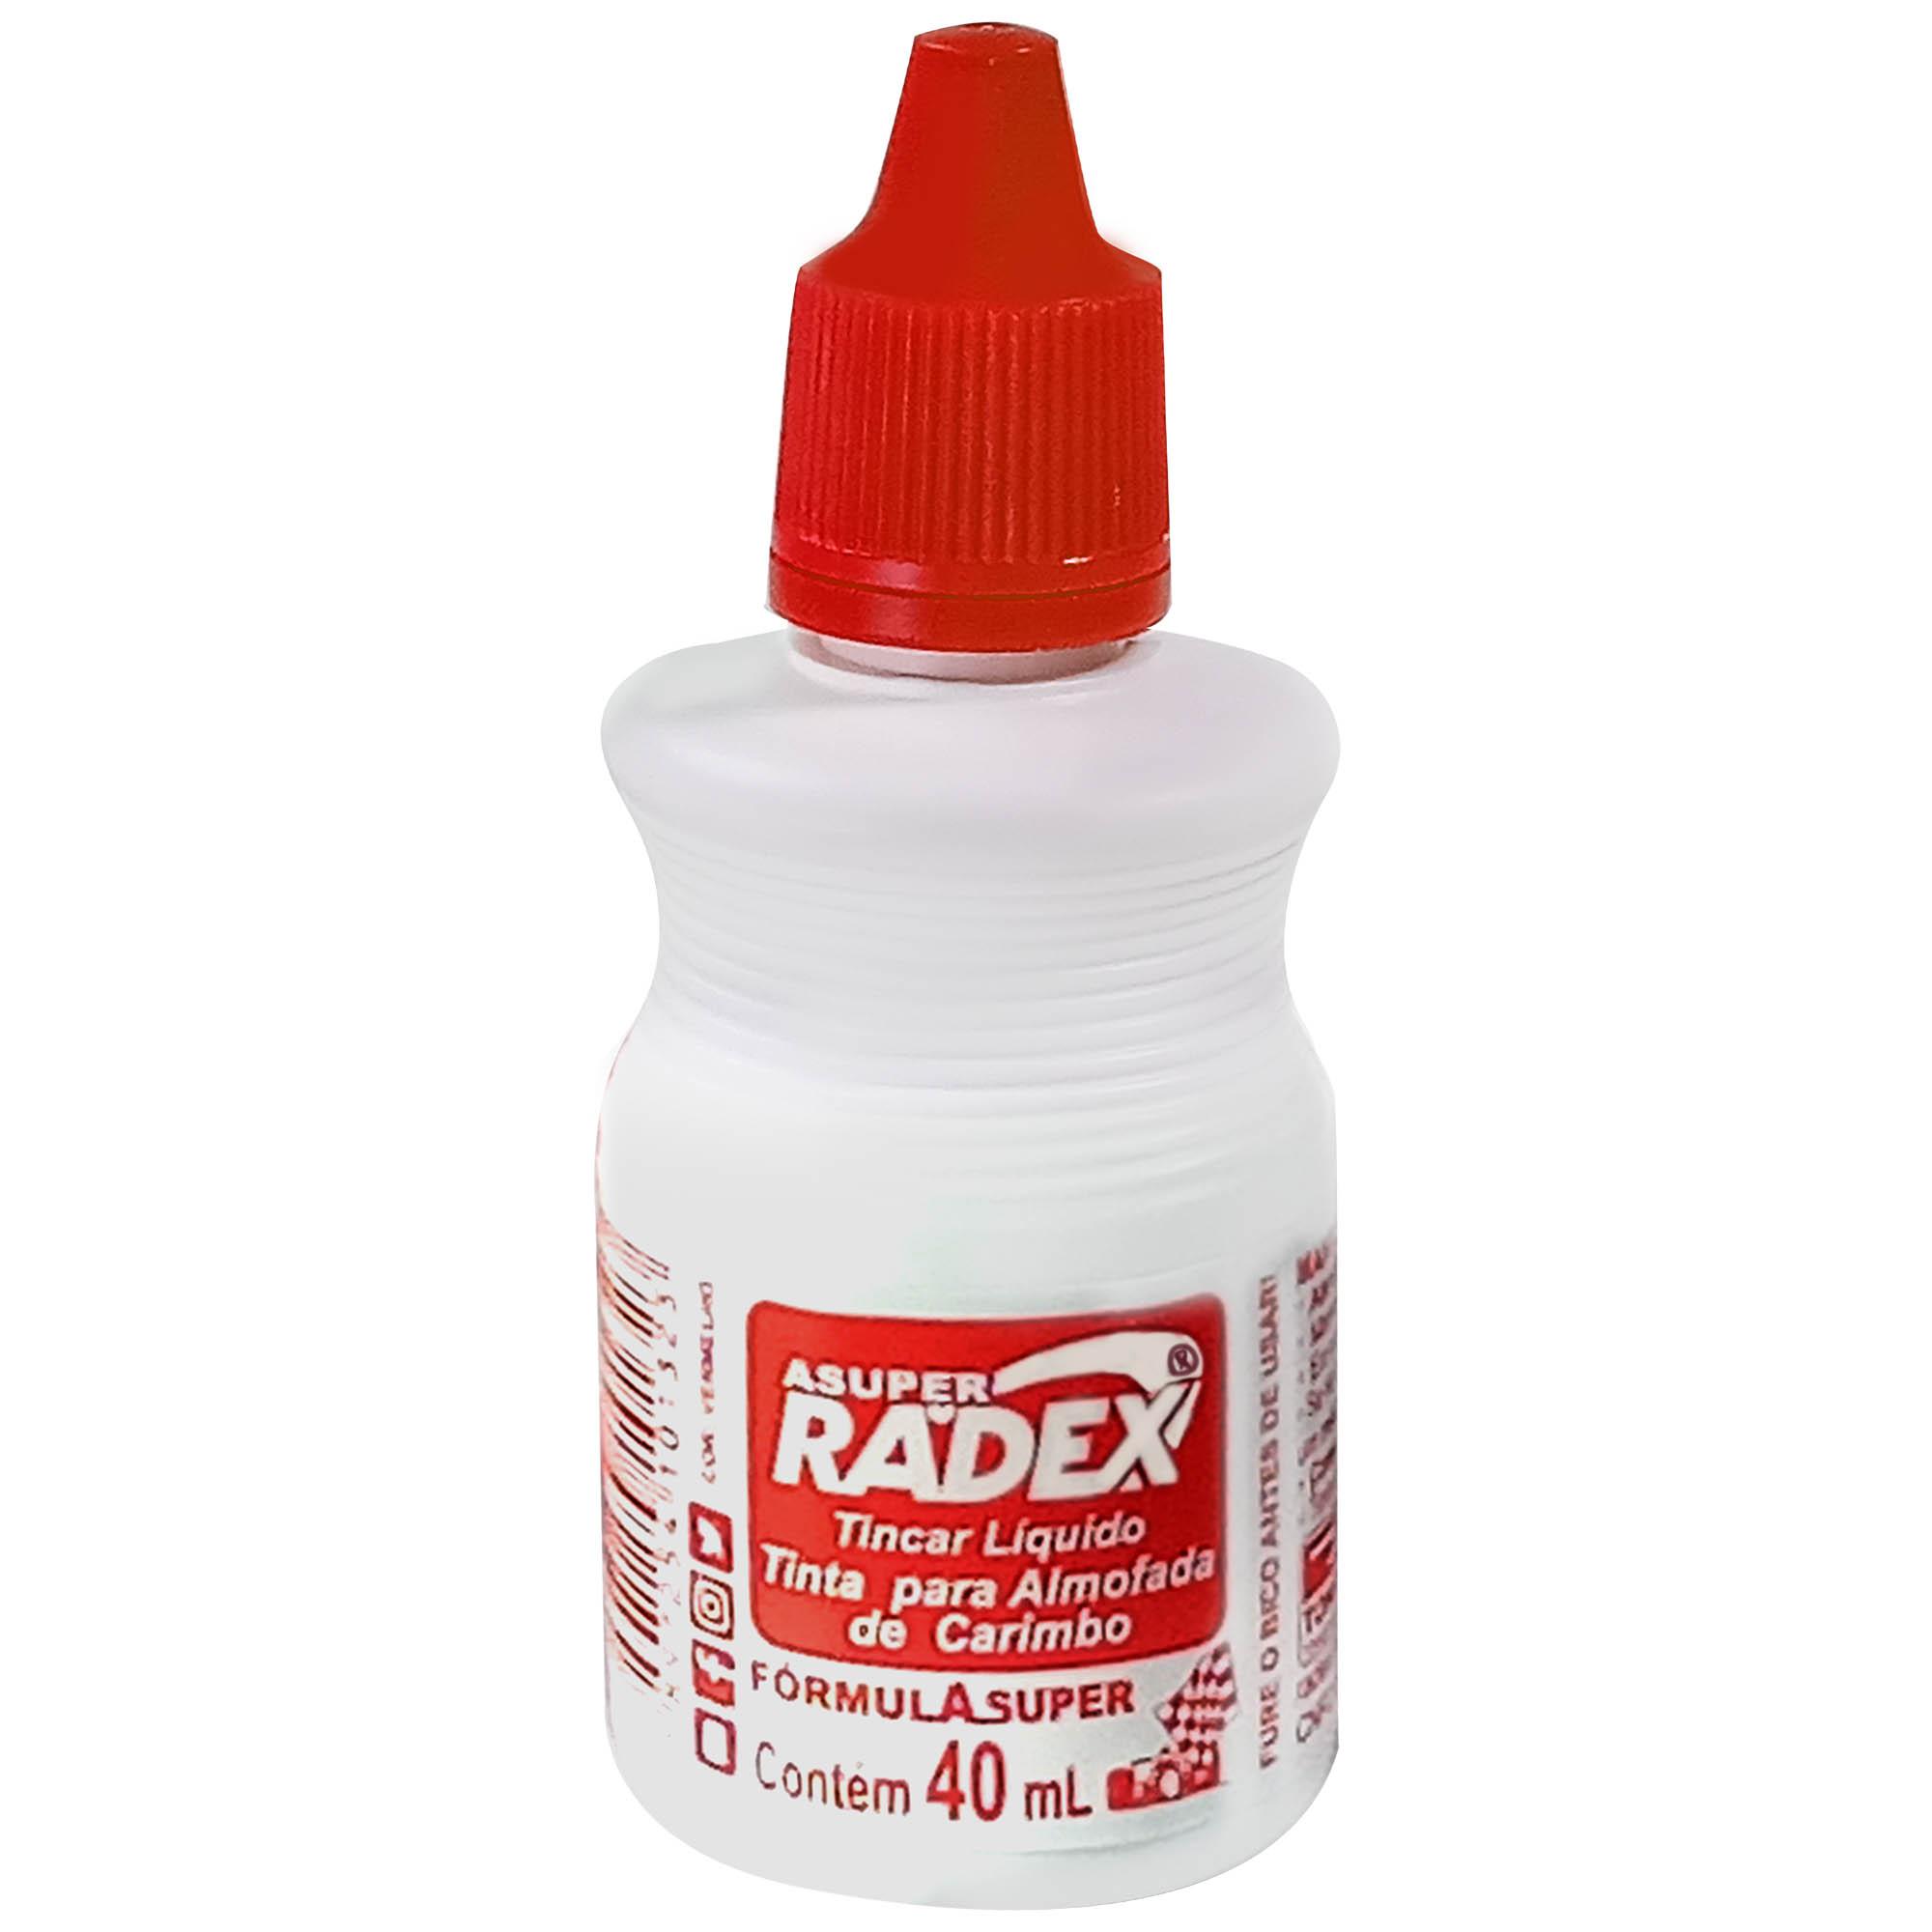 Tinta para Carimbo 40ml Cor Vermelha - Radex